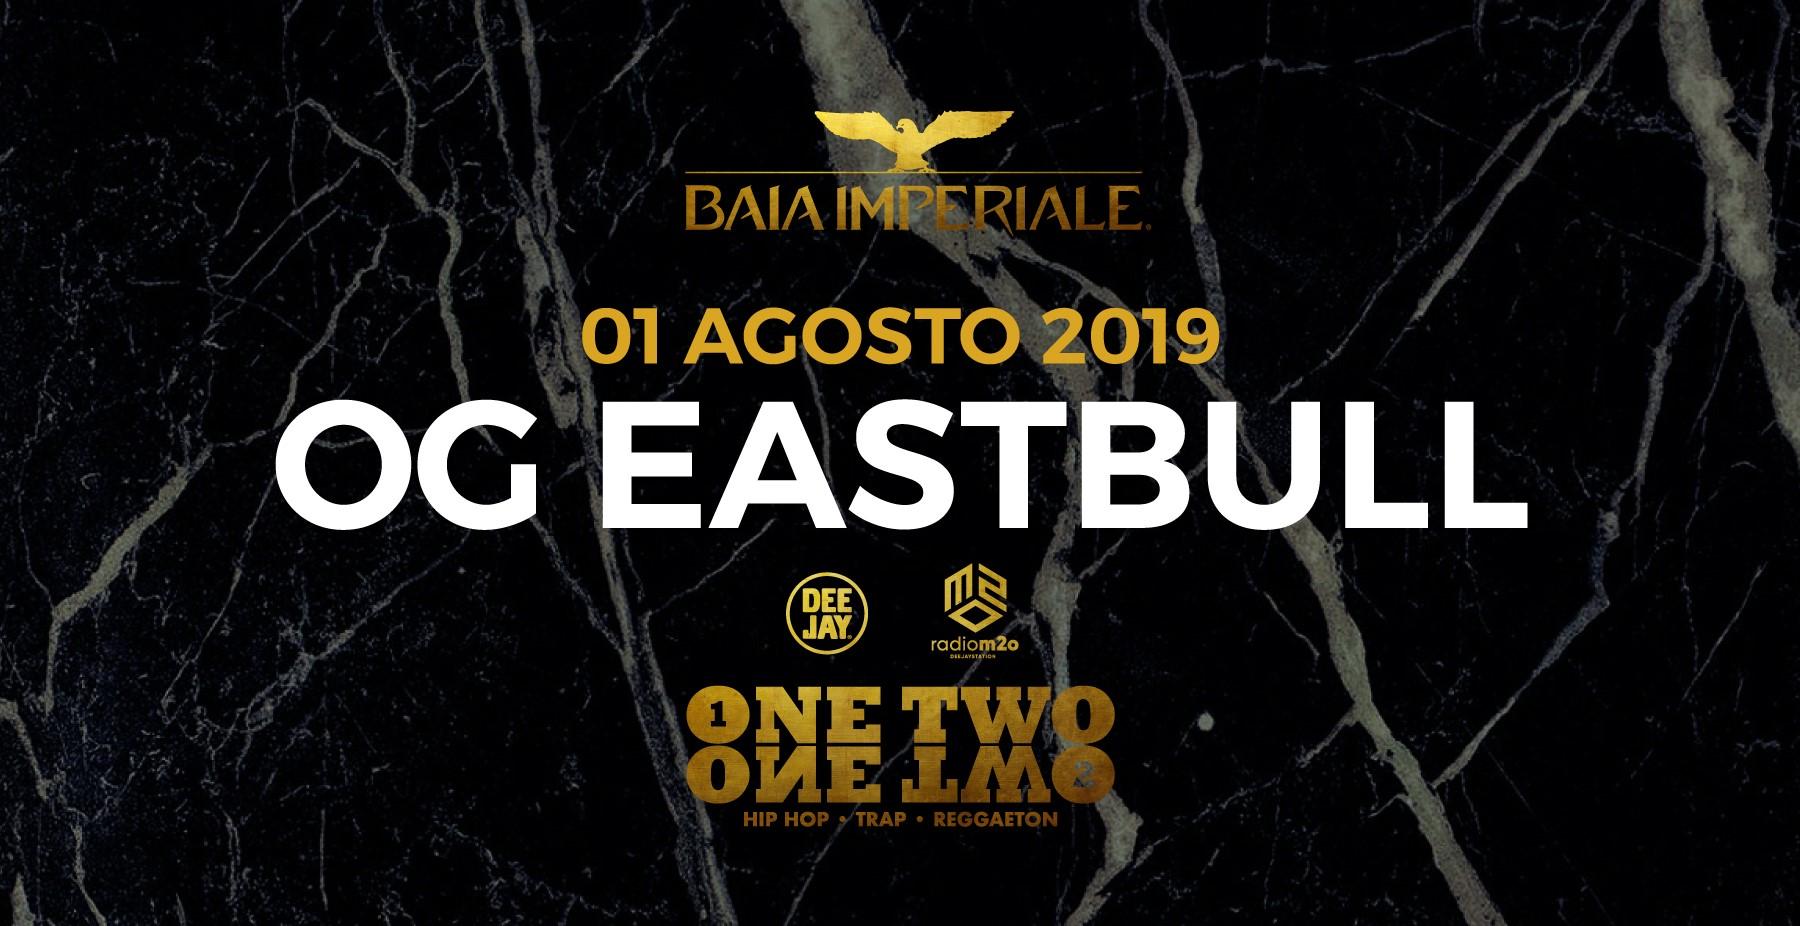 Giovedì 1 Agosto 2019 – Baia Imperiale – One Two One Two – Og Eastbull -Ticket-Biglietti 18app – Tavoli – Pacchetti Hotel